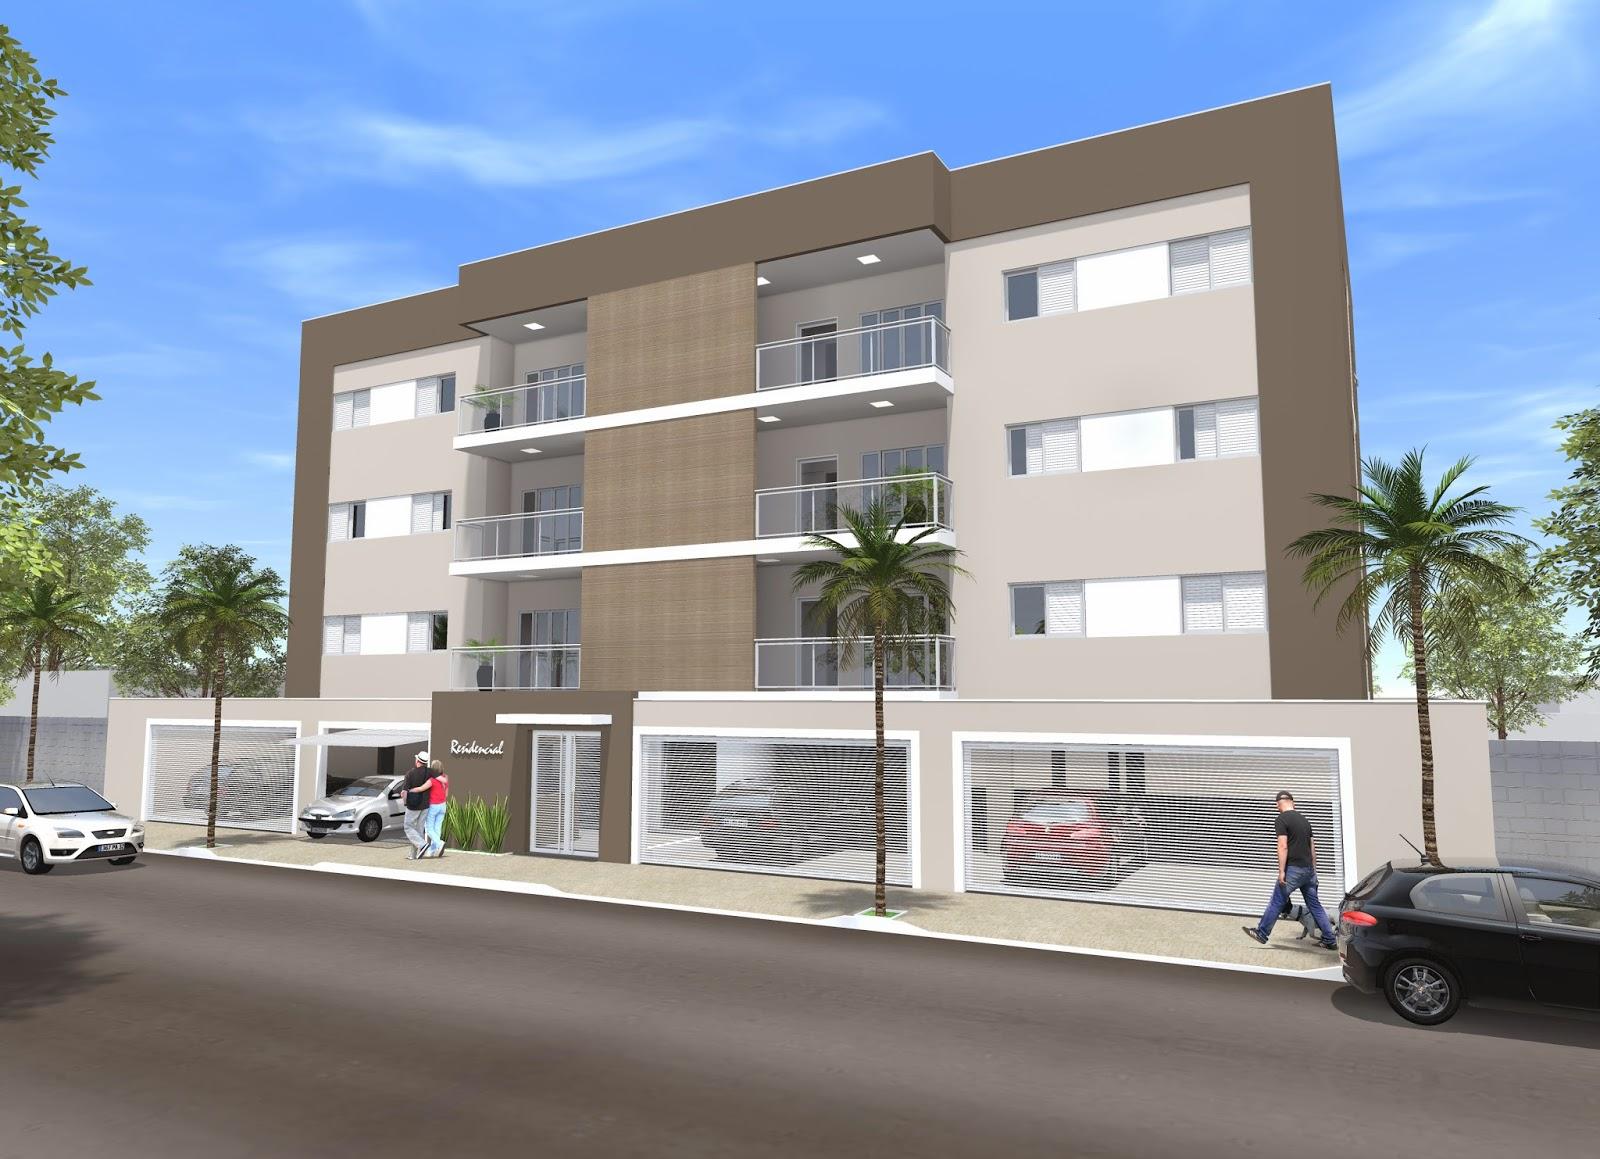 #0656C5 LEILA FREITAS Corretora: COD. 142  Apartamentos Jardim Grande  4362 Janela Aluminio Entrando Agua